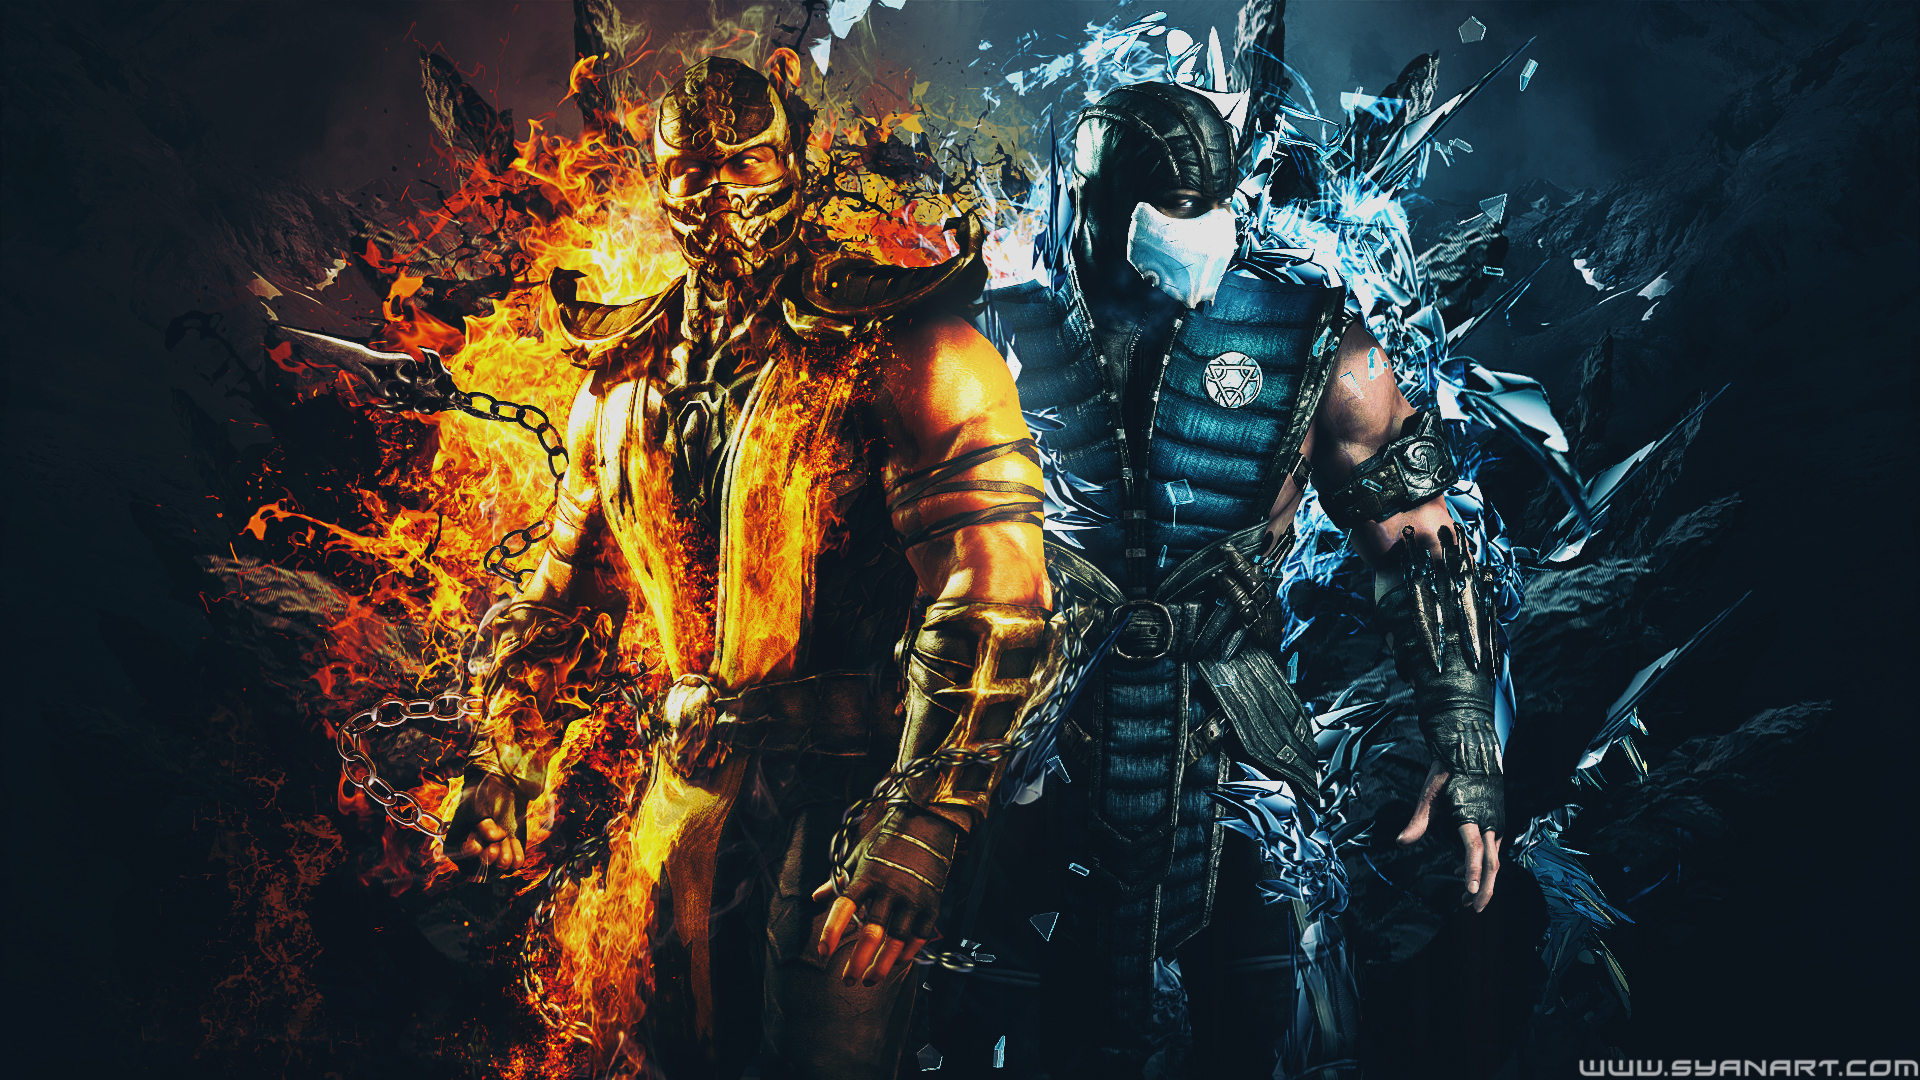 Mortal Kombat Xl Scorpion Vs Subzero Wallpaper Syanart Station